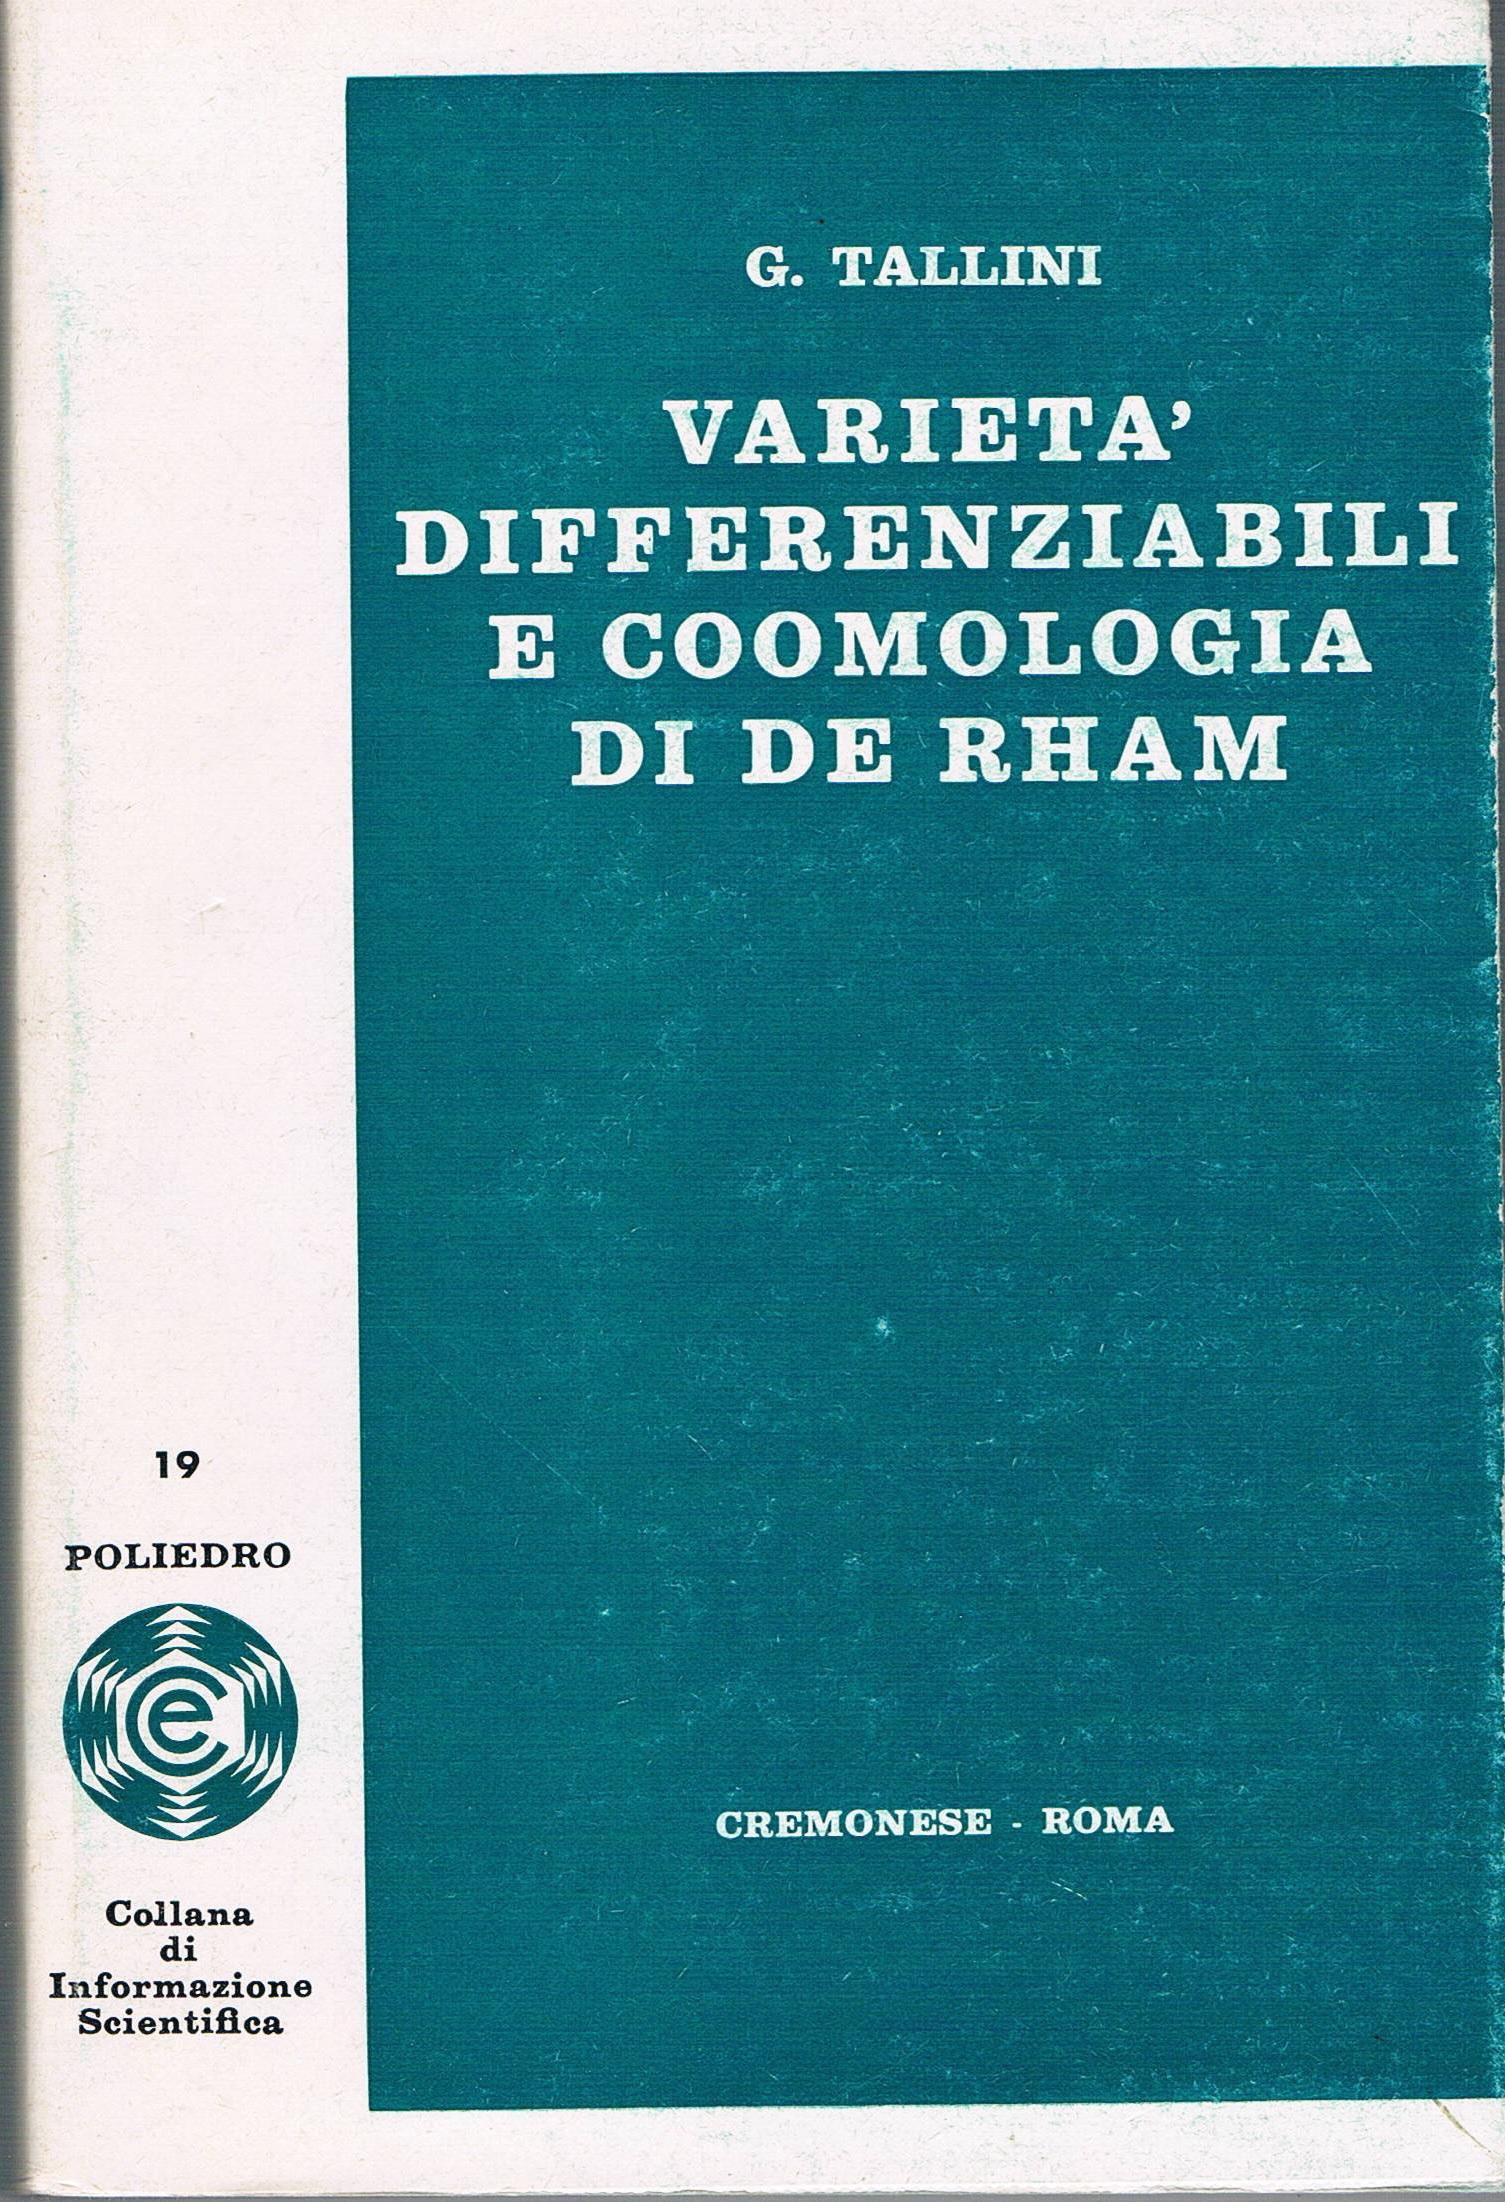 Varietà differenziabili e coomologia di de Rham